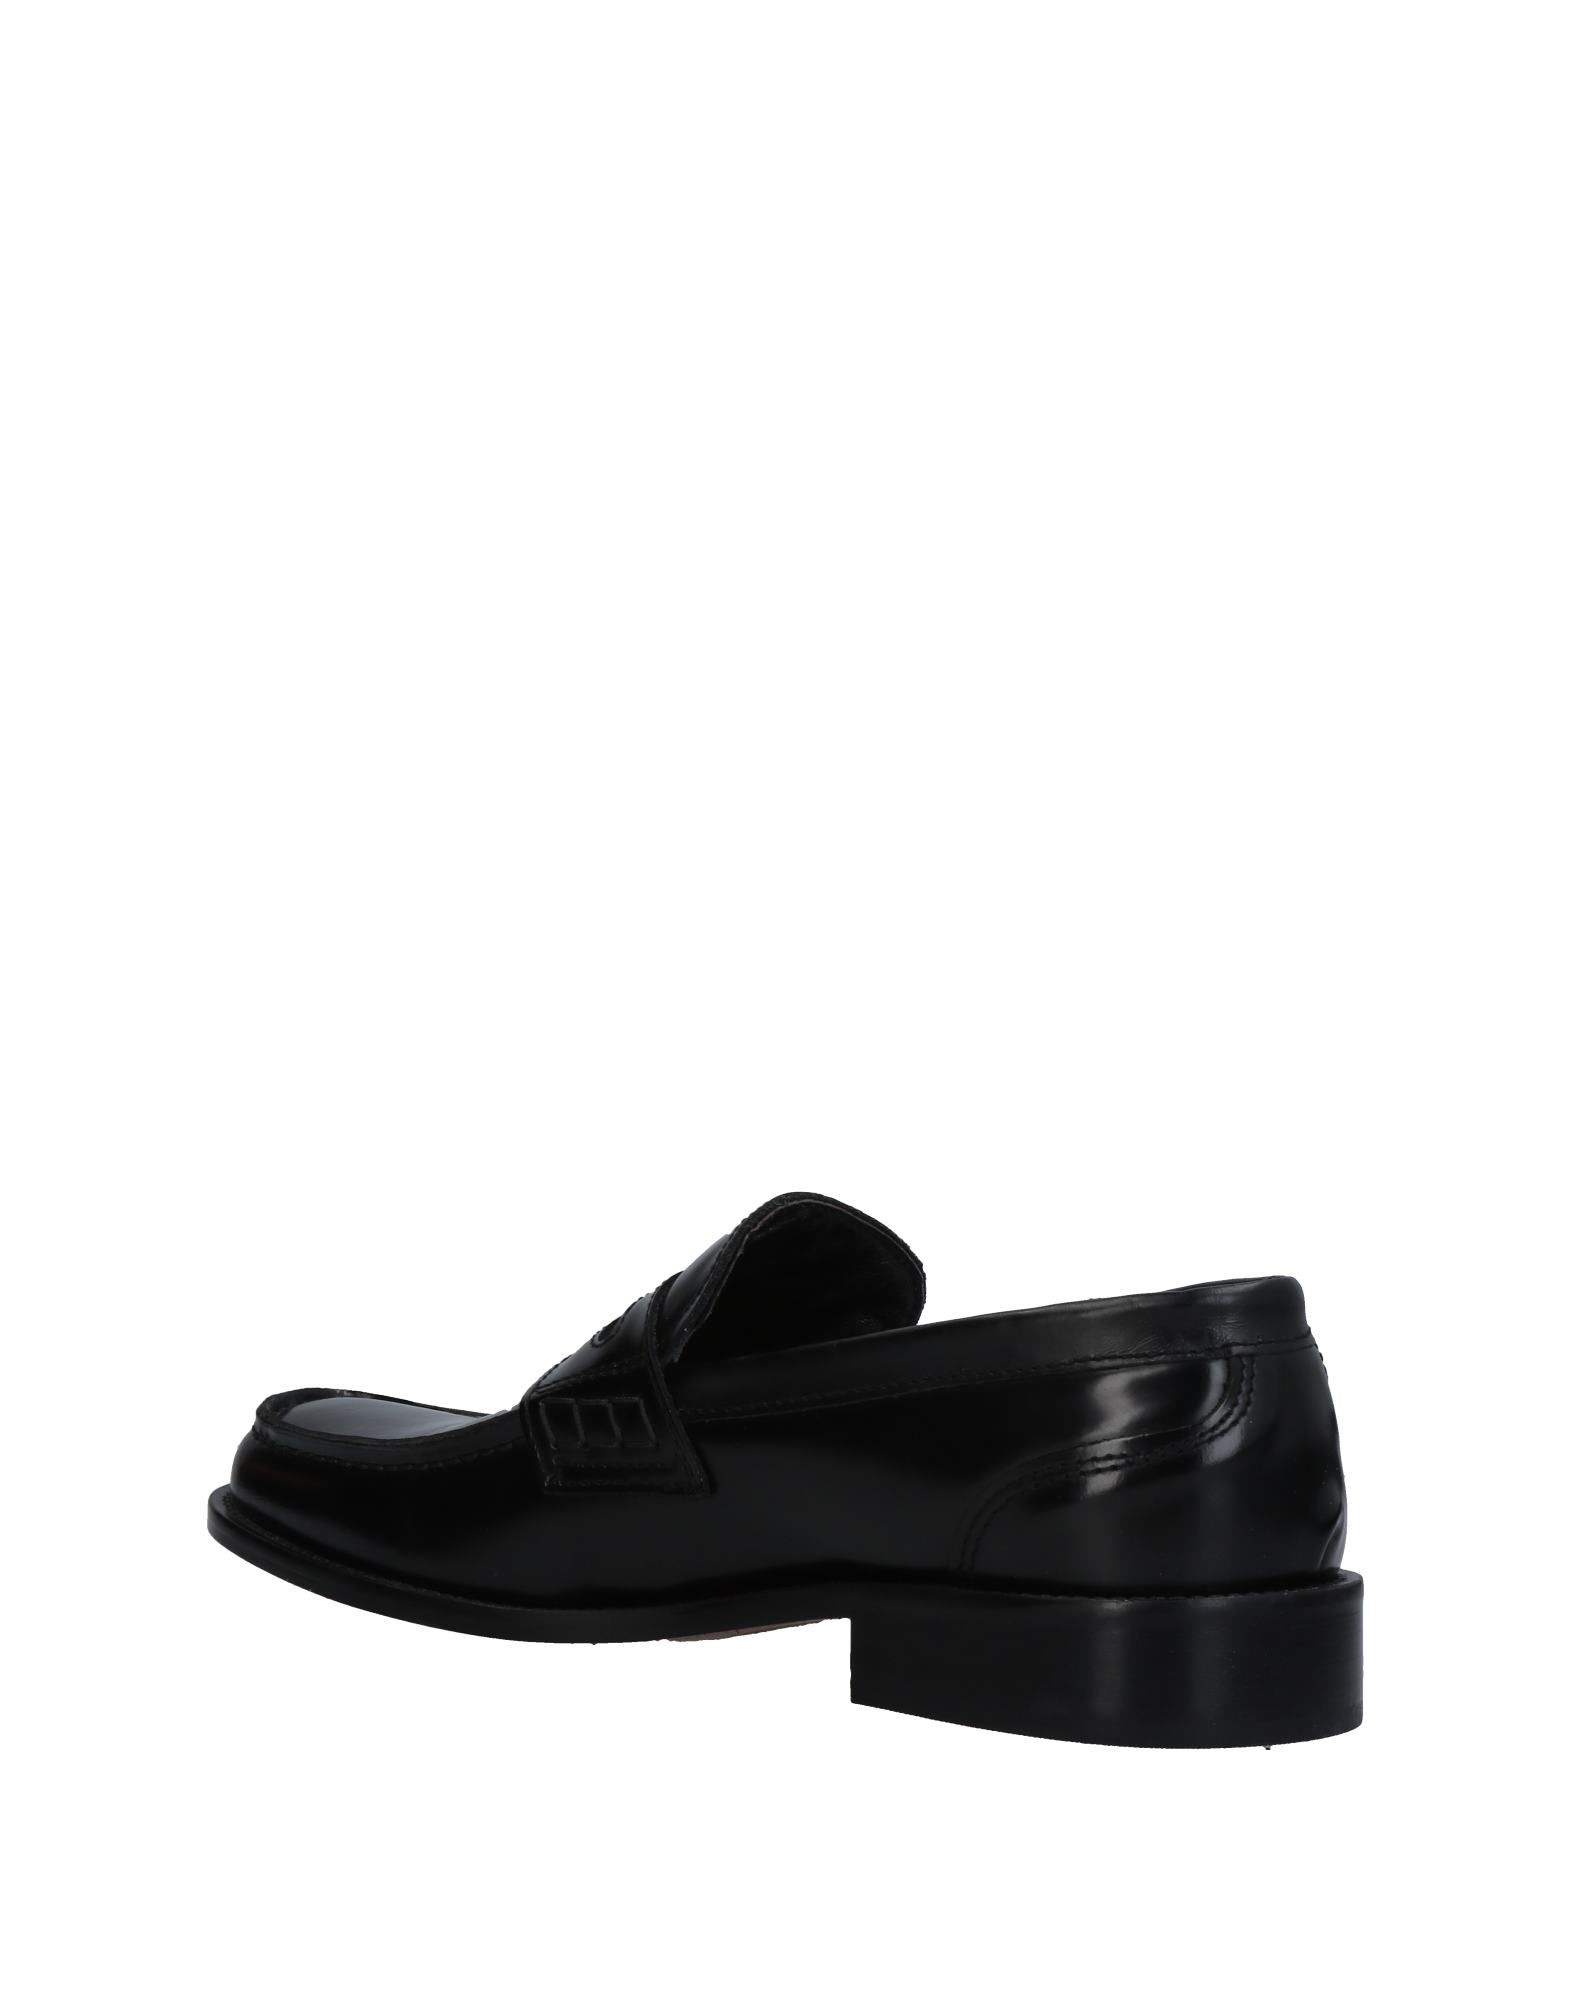 Rabatt echte  Schuhe Brawn's Mokassins Herren  echte 11455995JL 4c6ad9